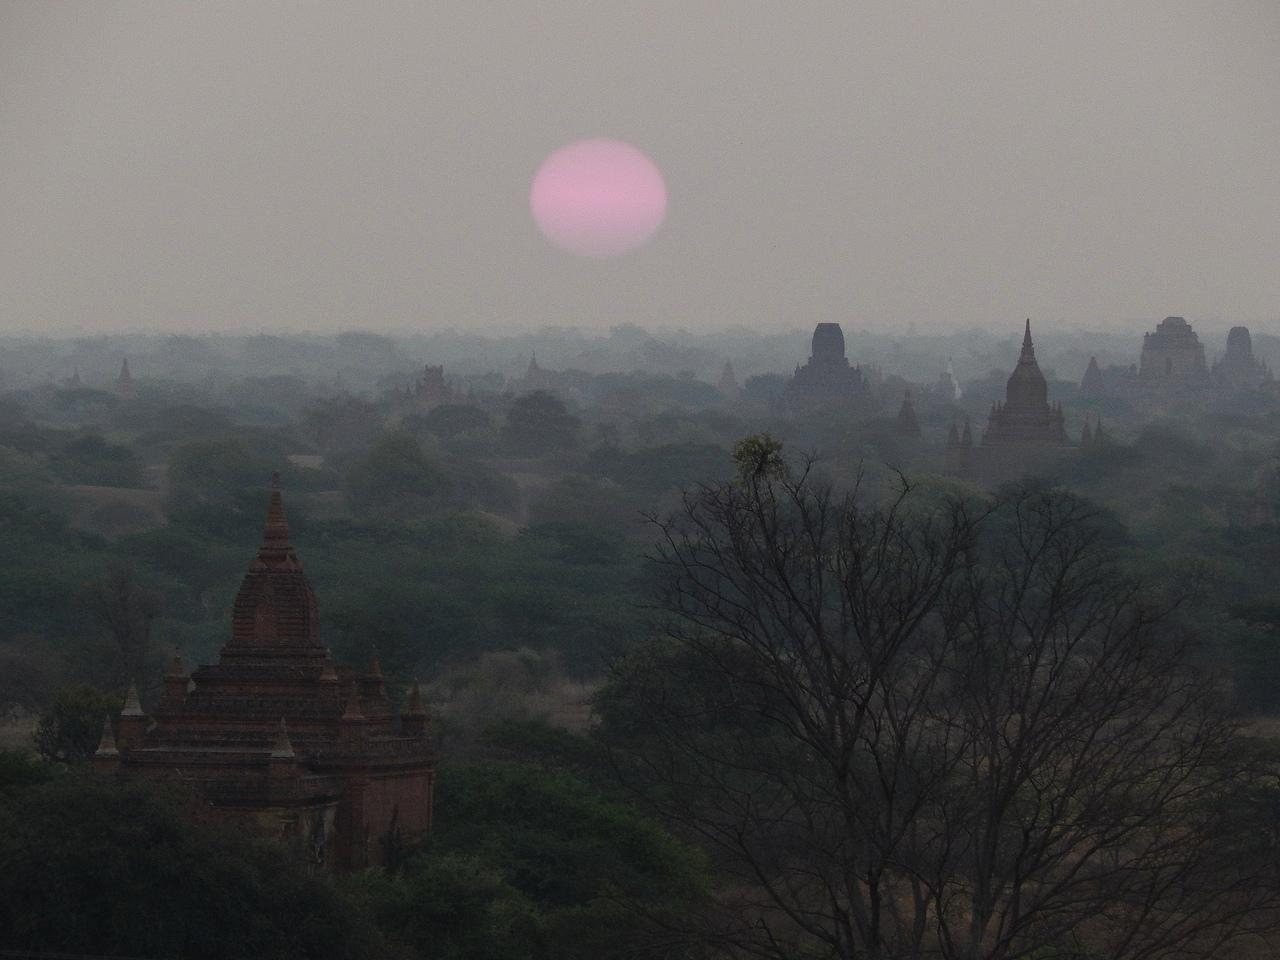 Мьянма. Рассвет в Багане.